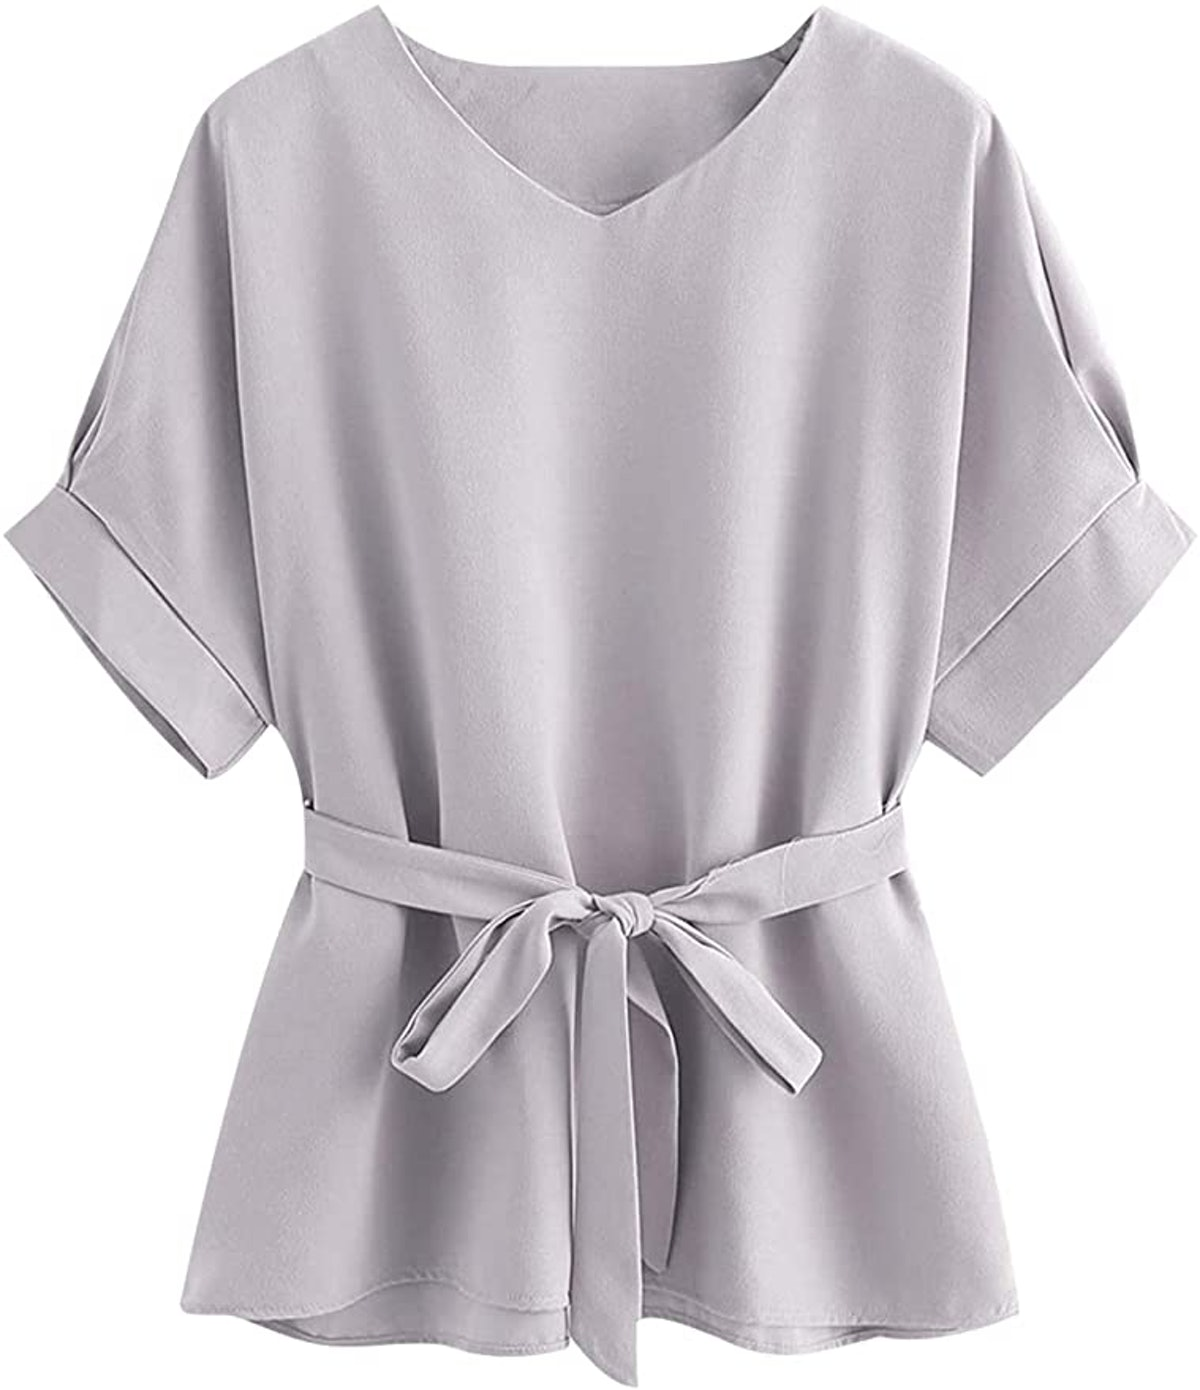 Milumia Short Sleeve Self Tie Tunic Top